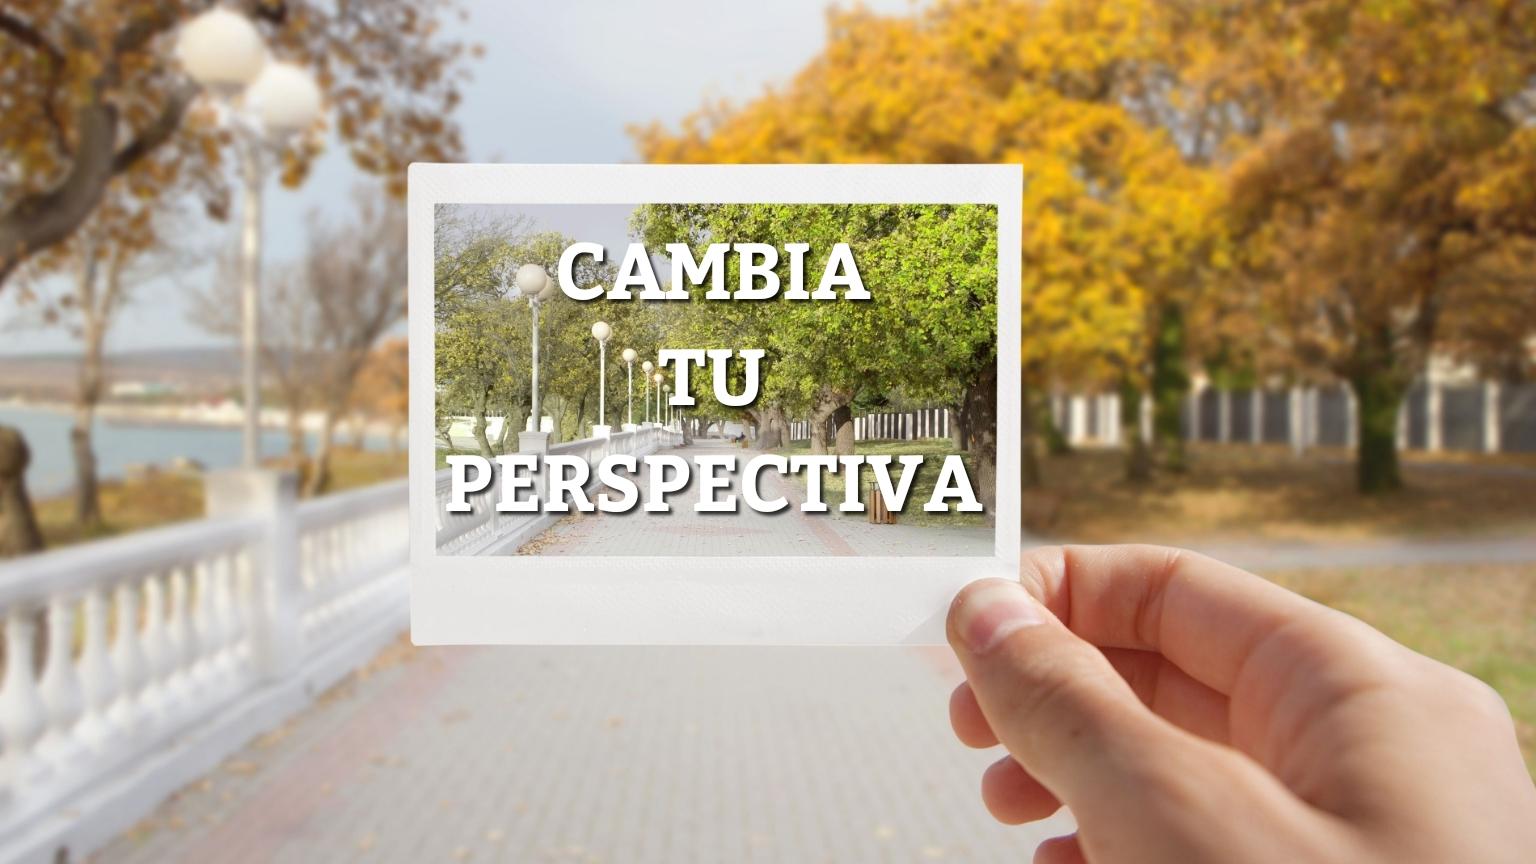 cambia tu perspectiva 08.25.29.jpg